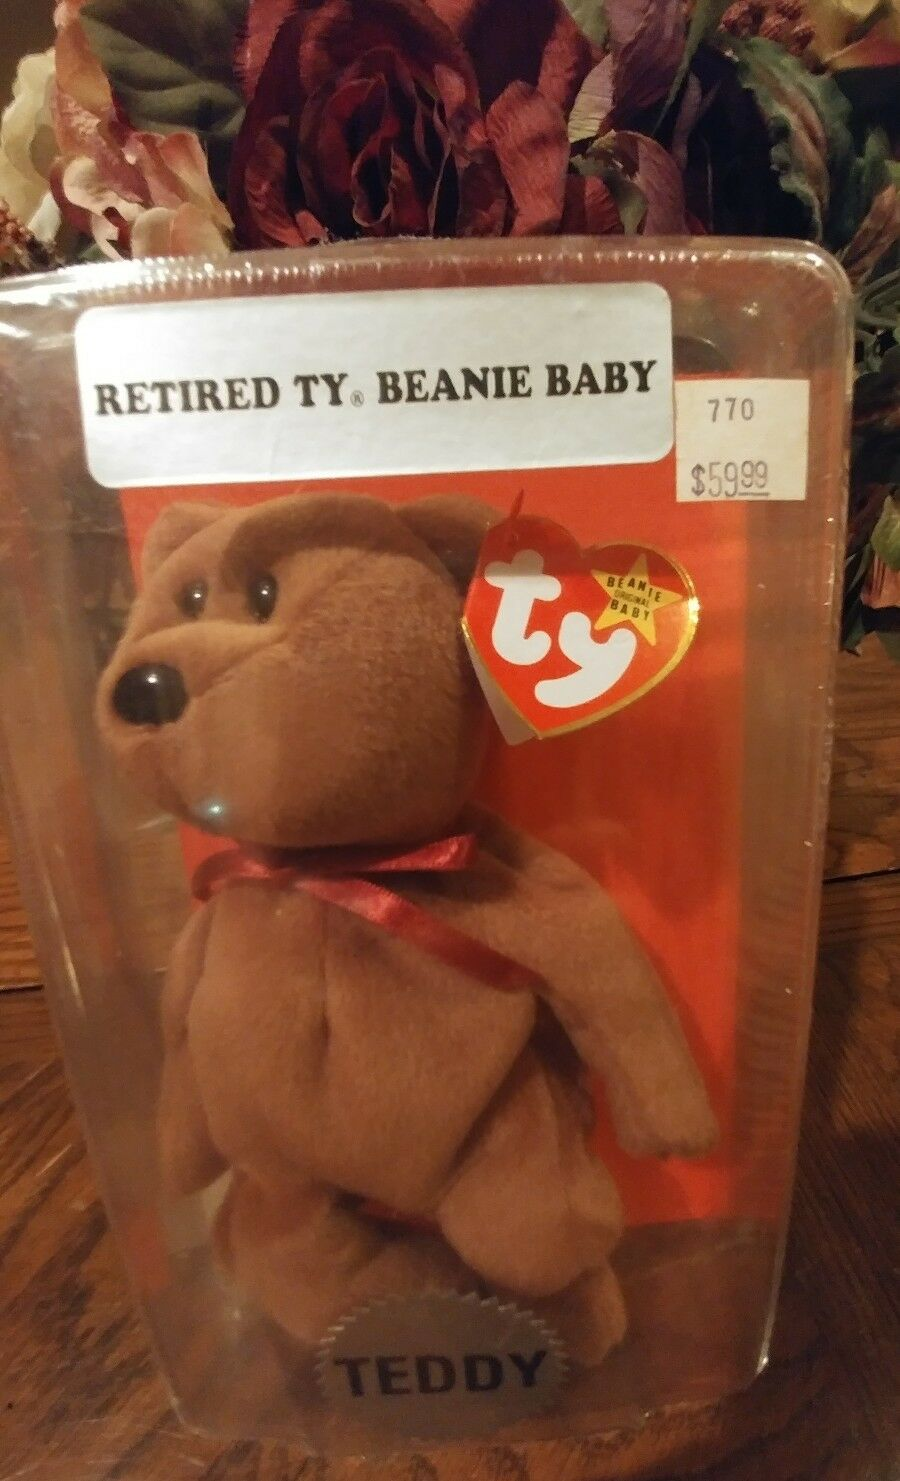 TEDDY TY Beanie Baby Retired SEALED Mint